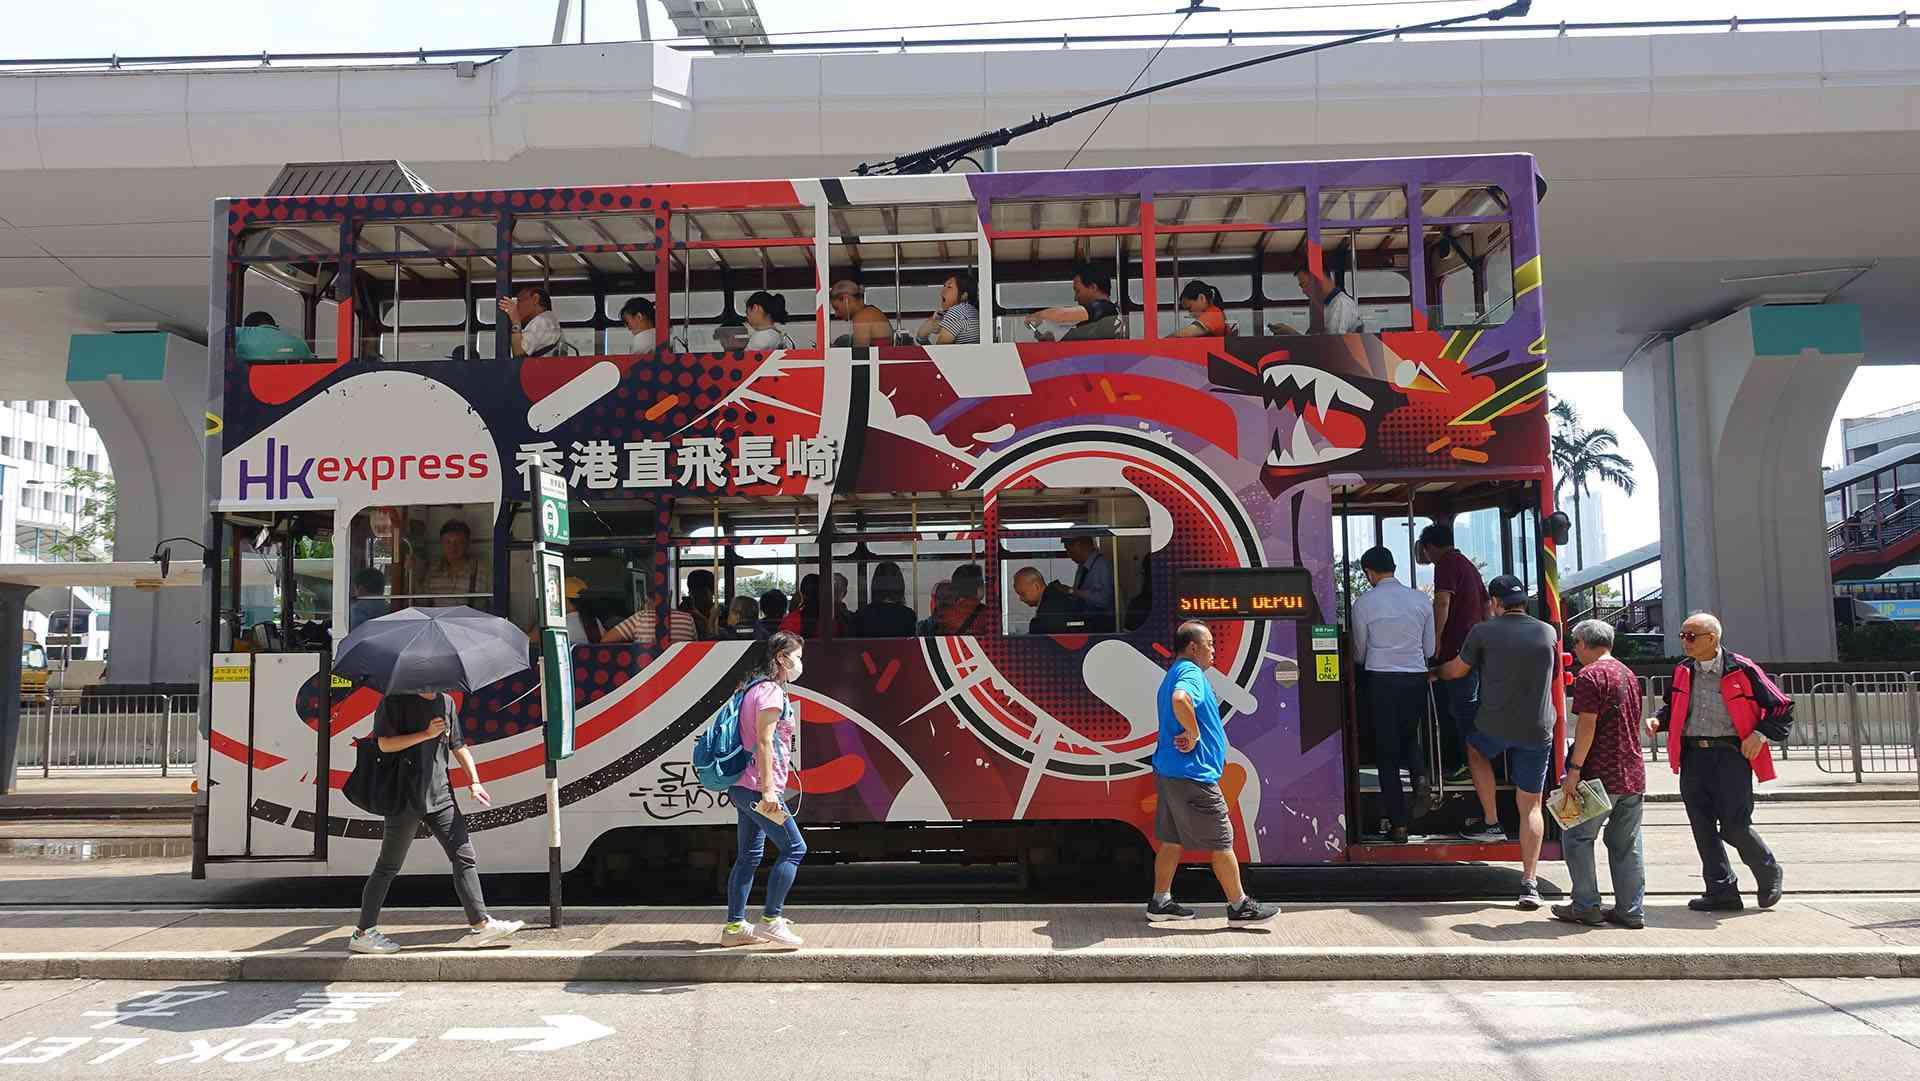 Tram in Central